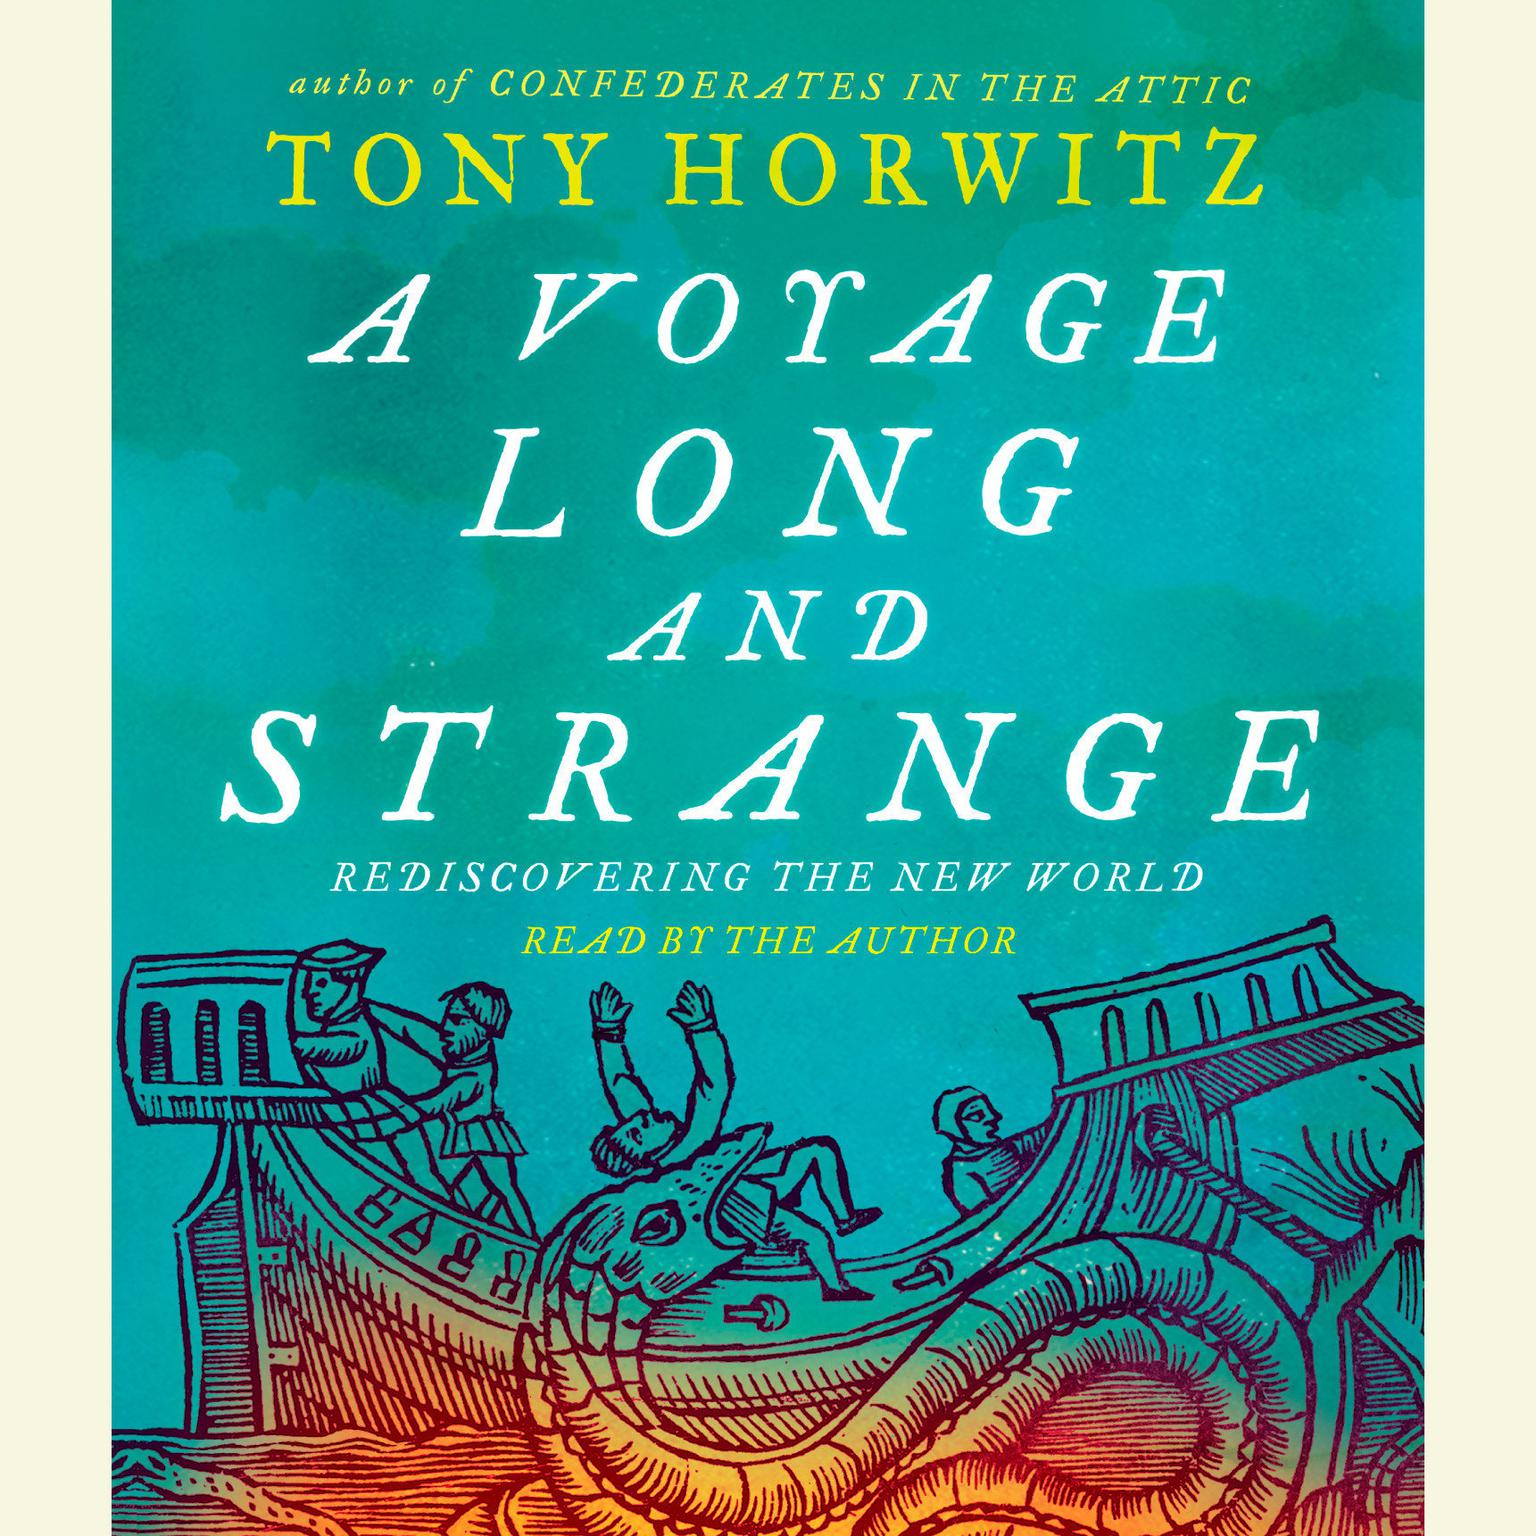 A Voyage Long and Strange (Abridged) Audiobook, by Tony Horwitz